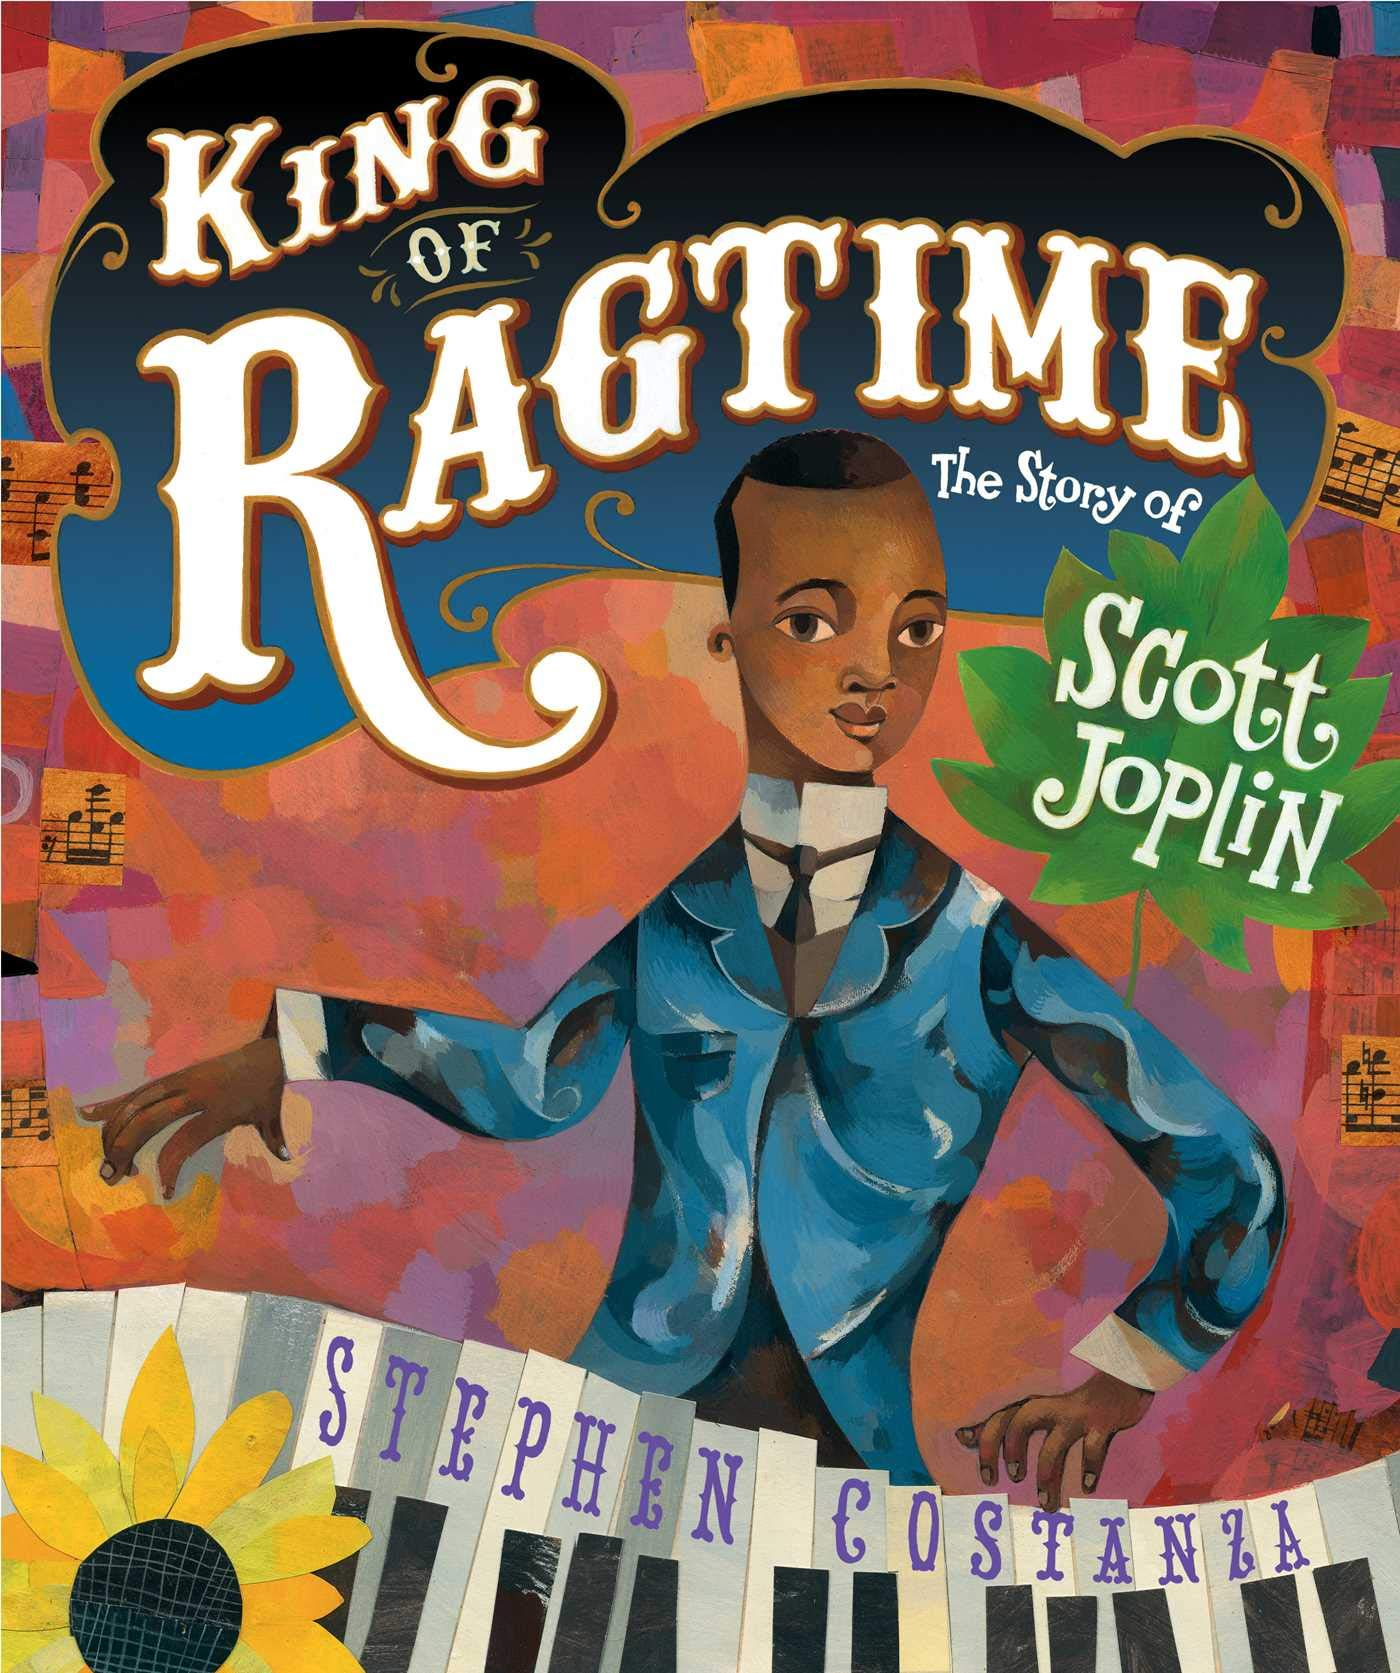 King of Ragtime: The Story of Scott Joplin: Costanza, Stephen, Costanza,  Stephen: 9781534410367: Amazon.com: Books